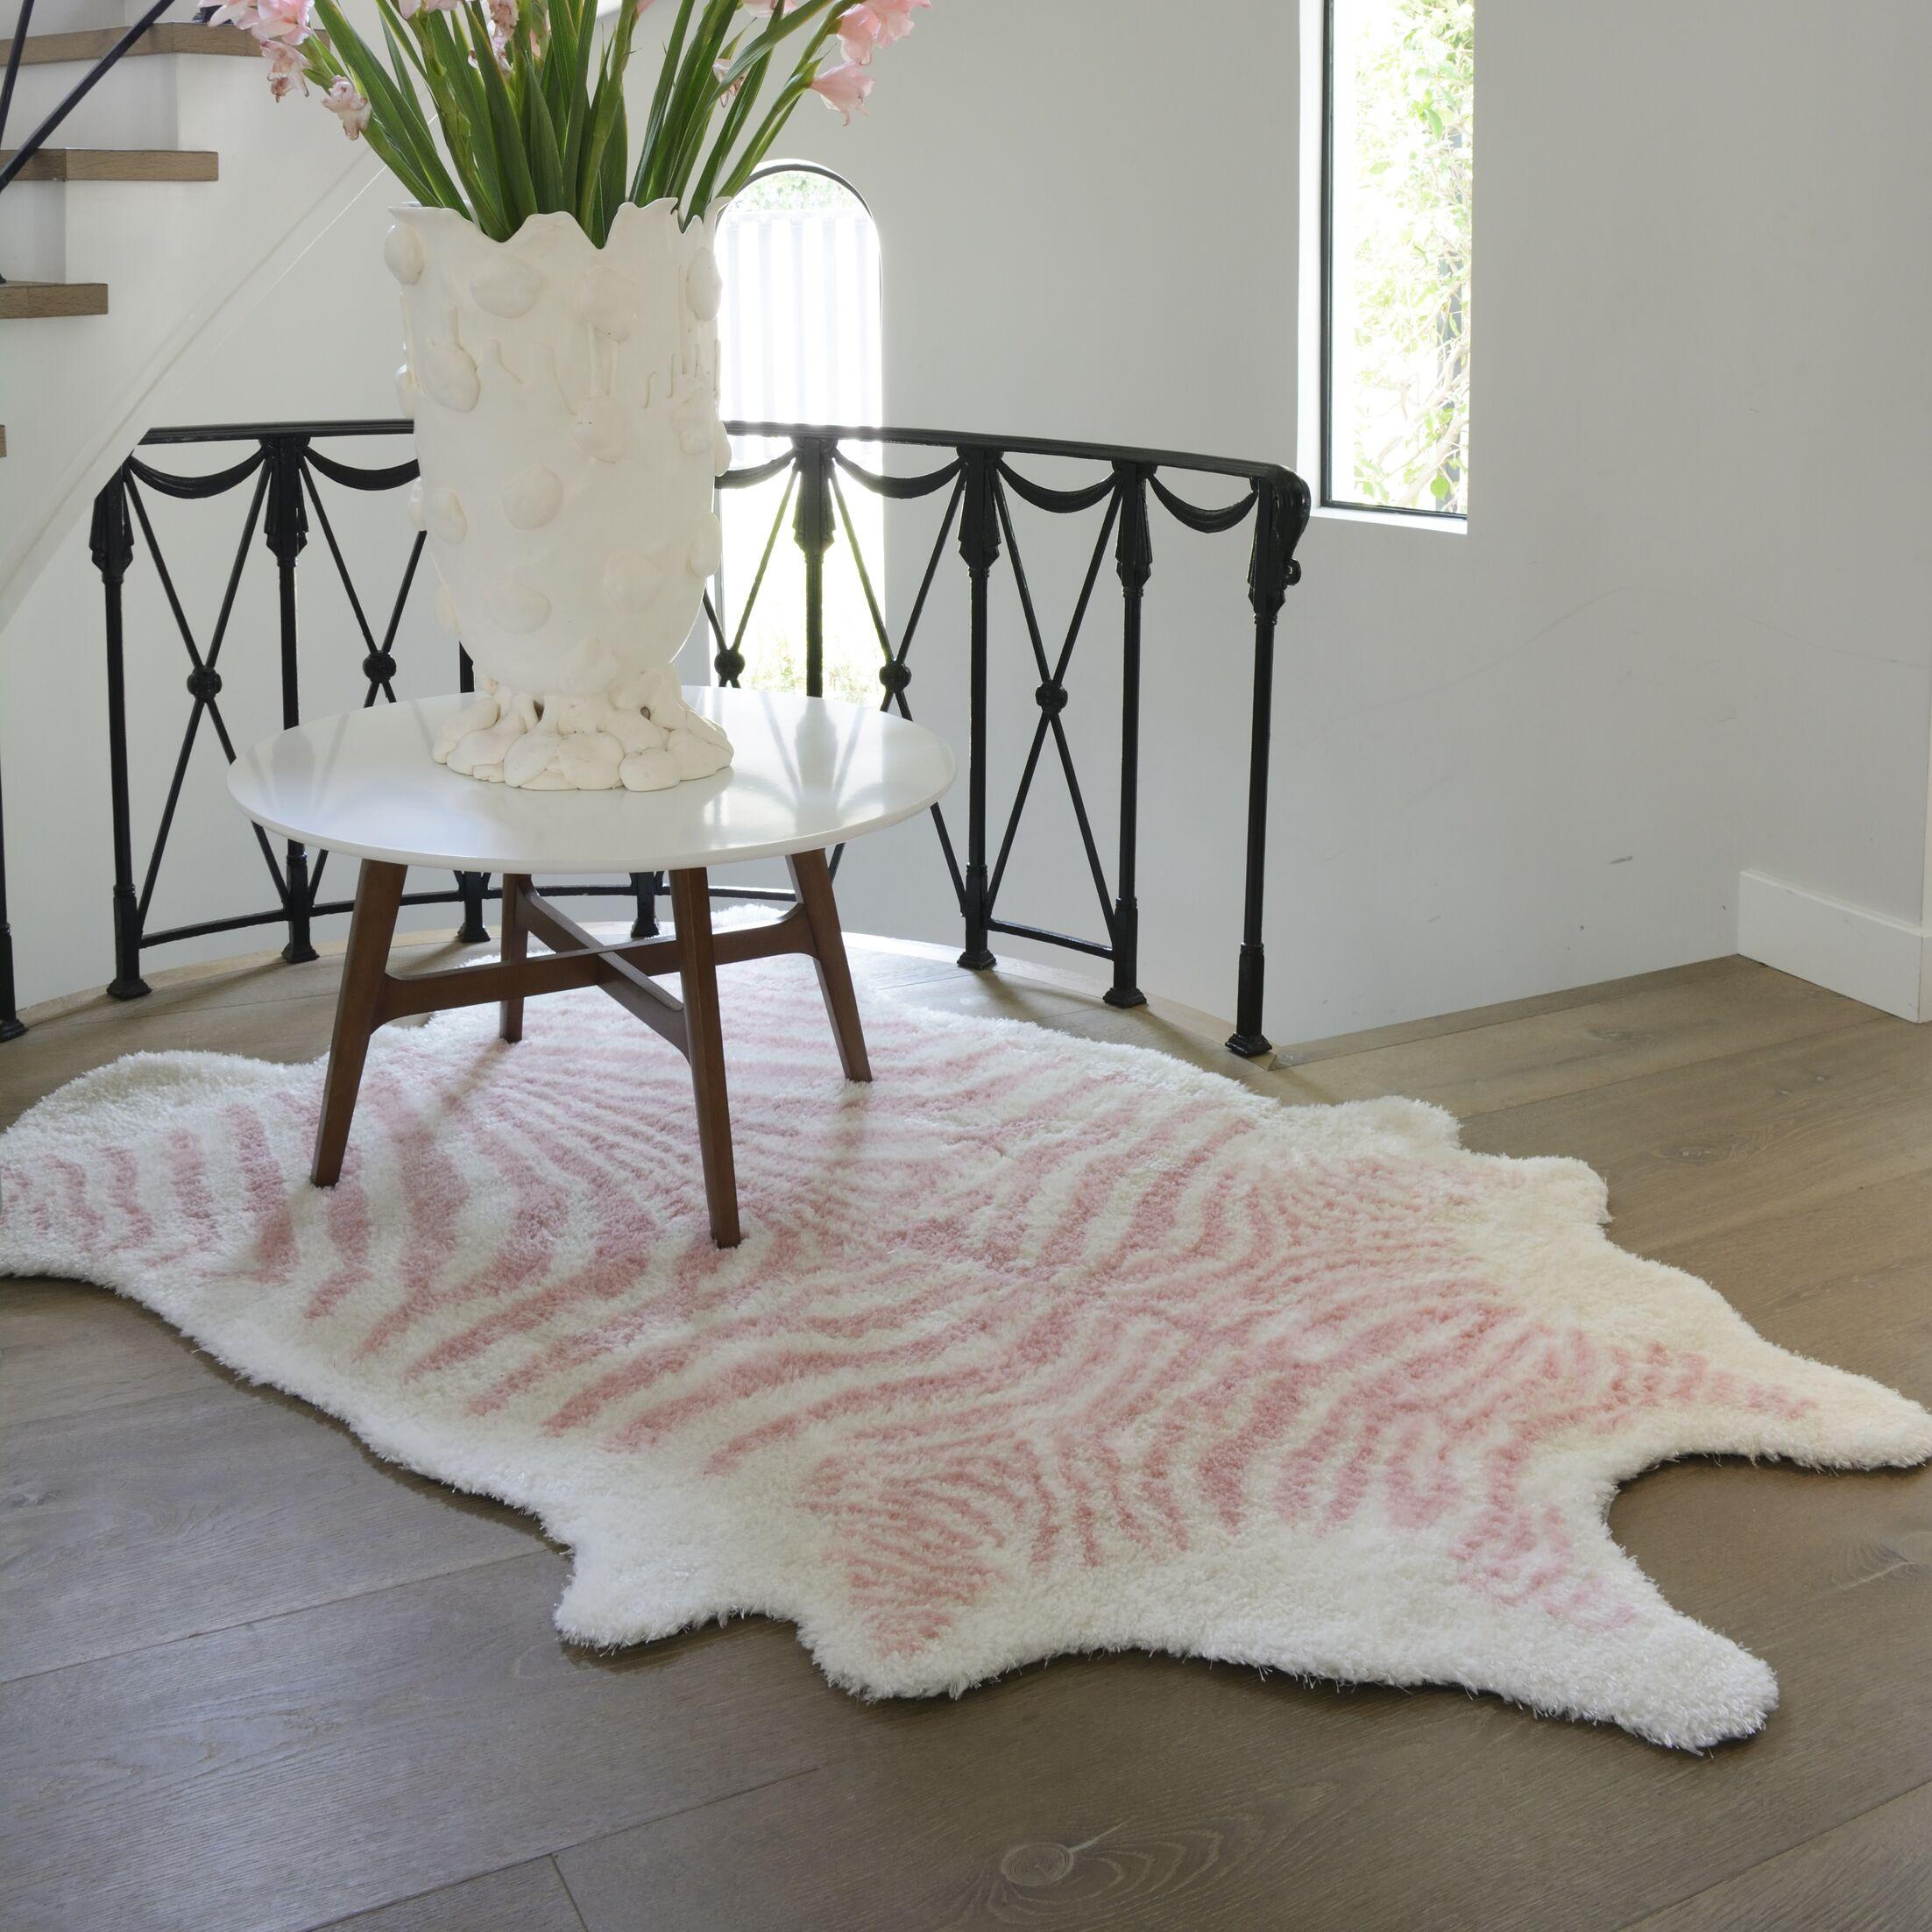 Khalhari Hand-Tufted Faux Fur Pink Area Rug Rug Size: Rectangle 7'6